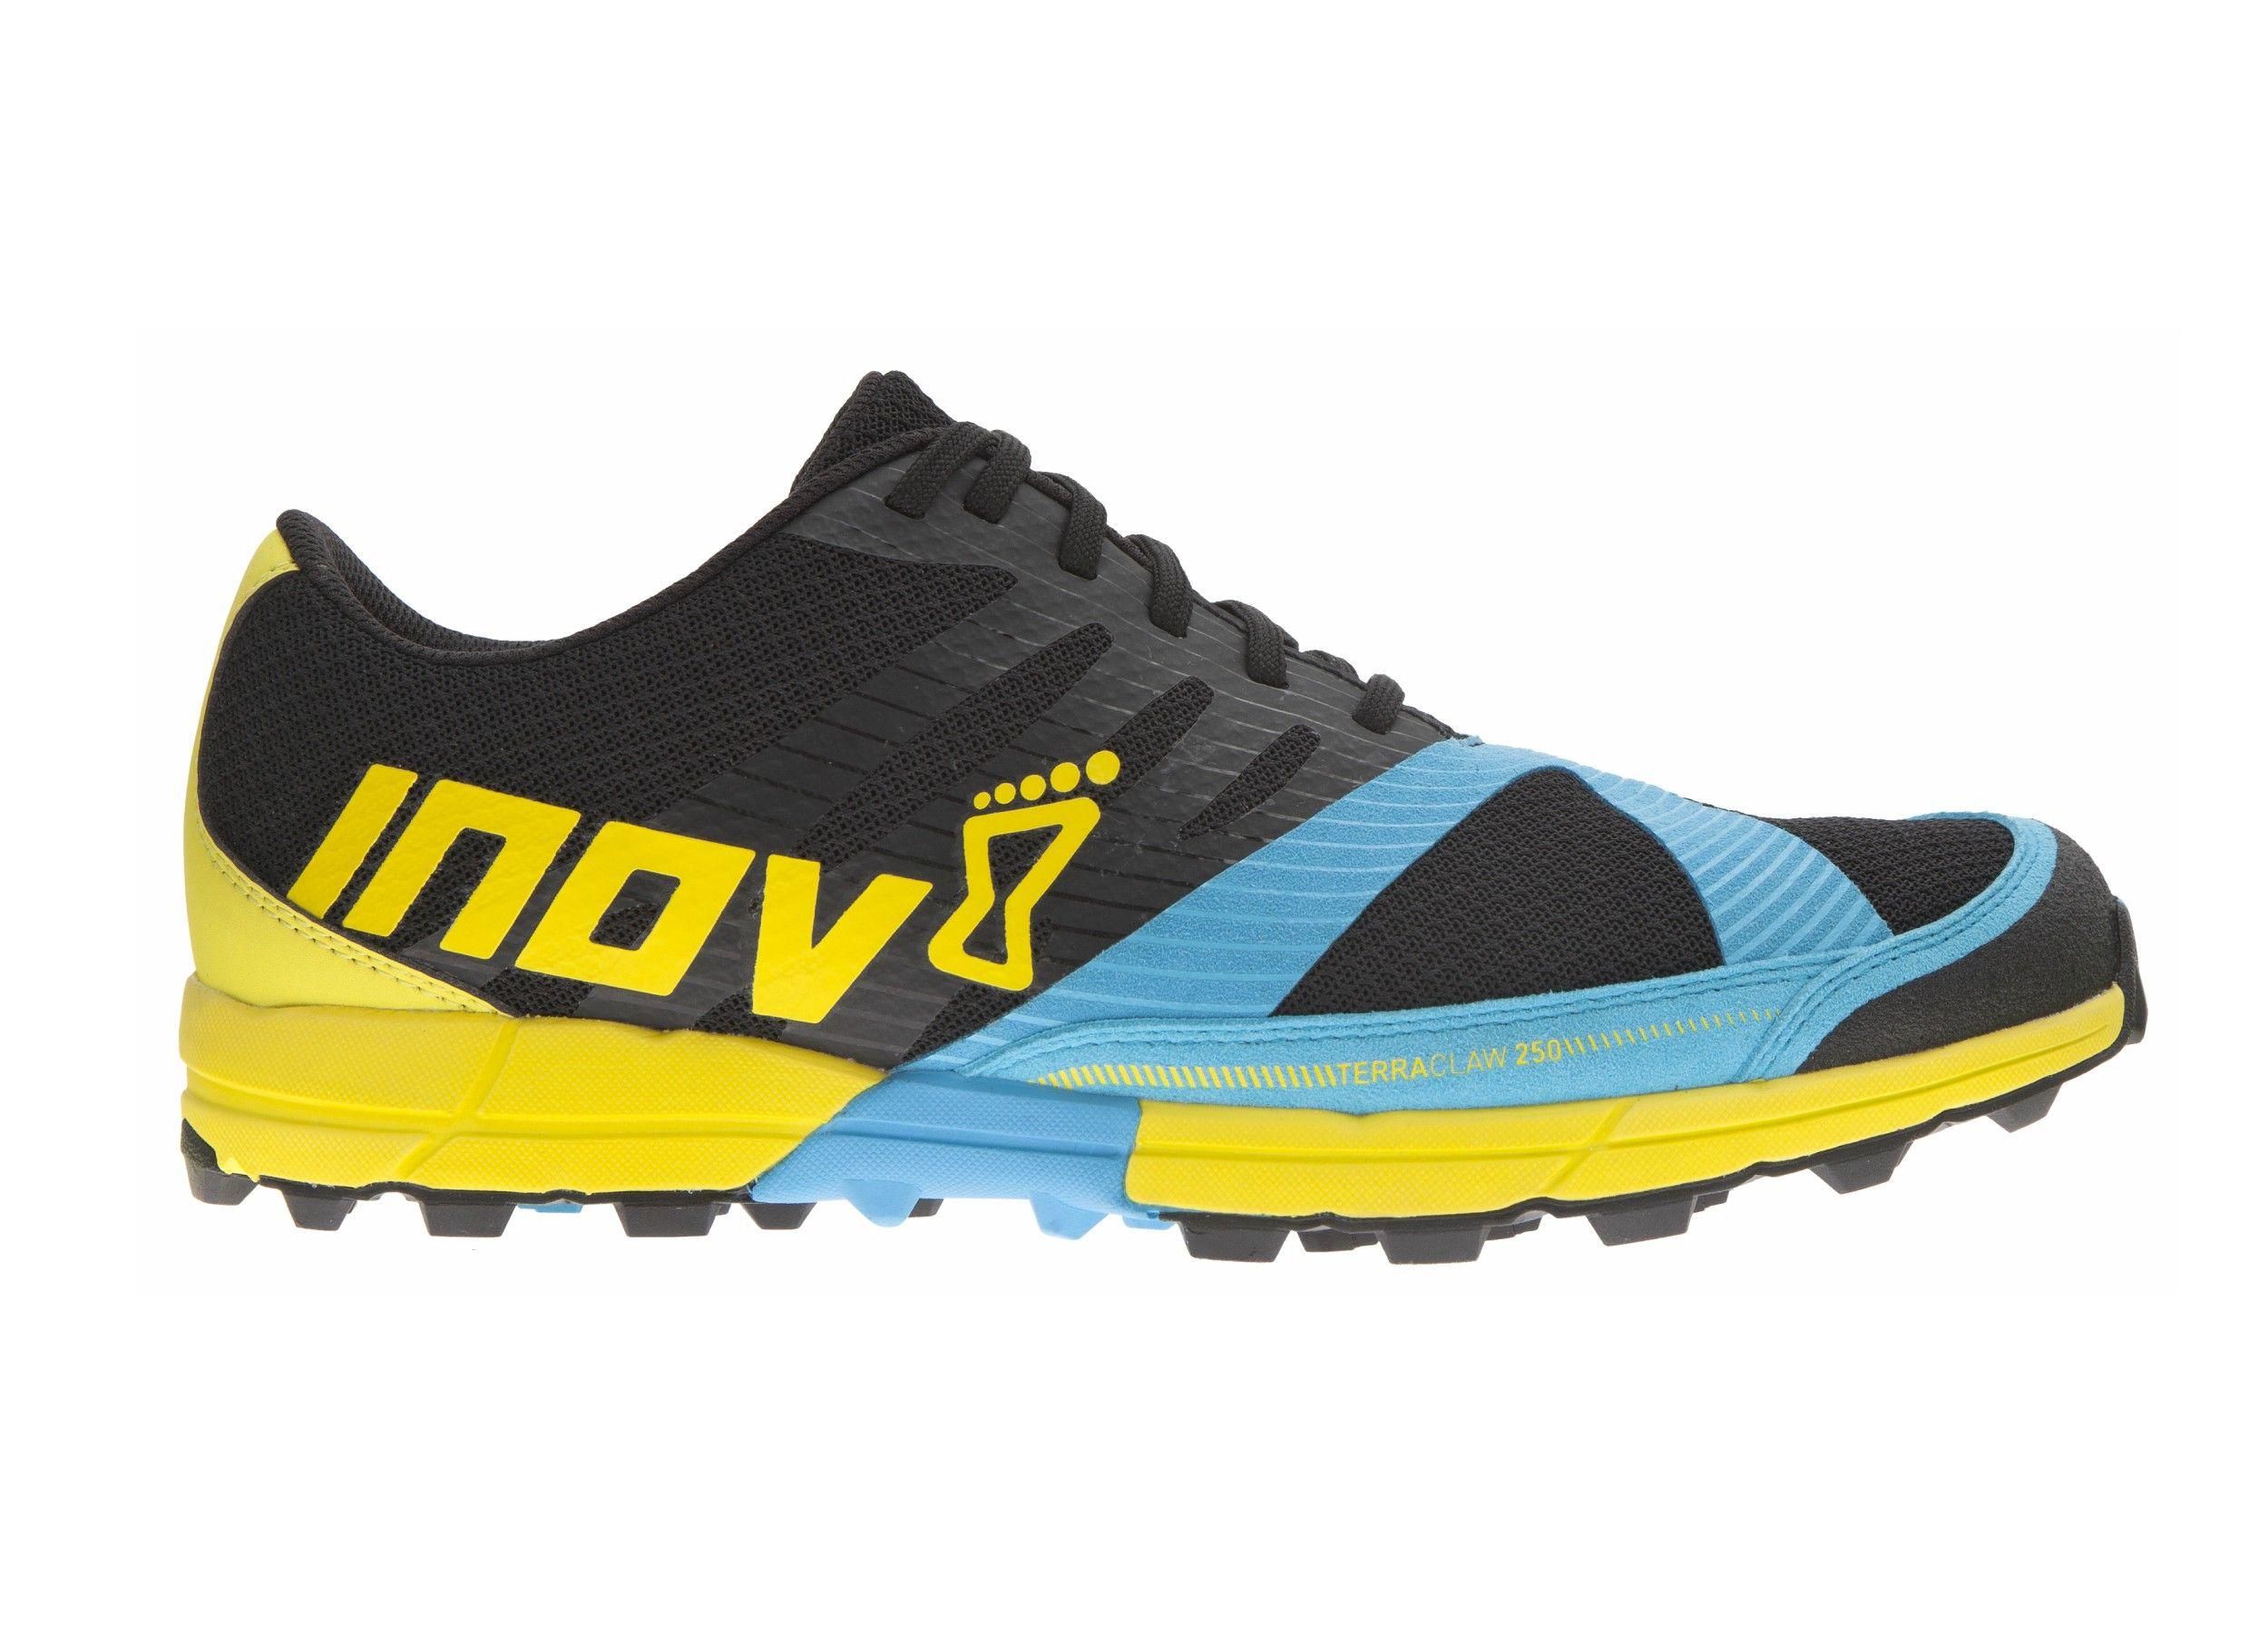 Best pris på Adidas Adizero XT 5 (Herre) Løpesko